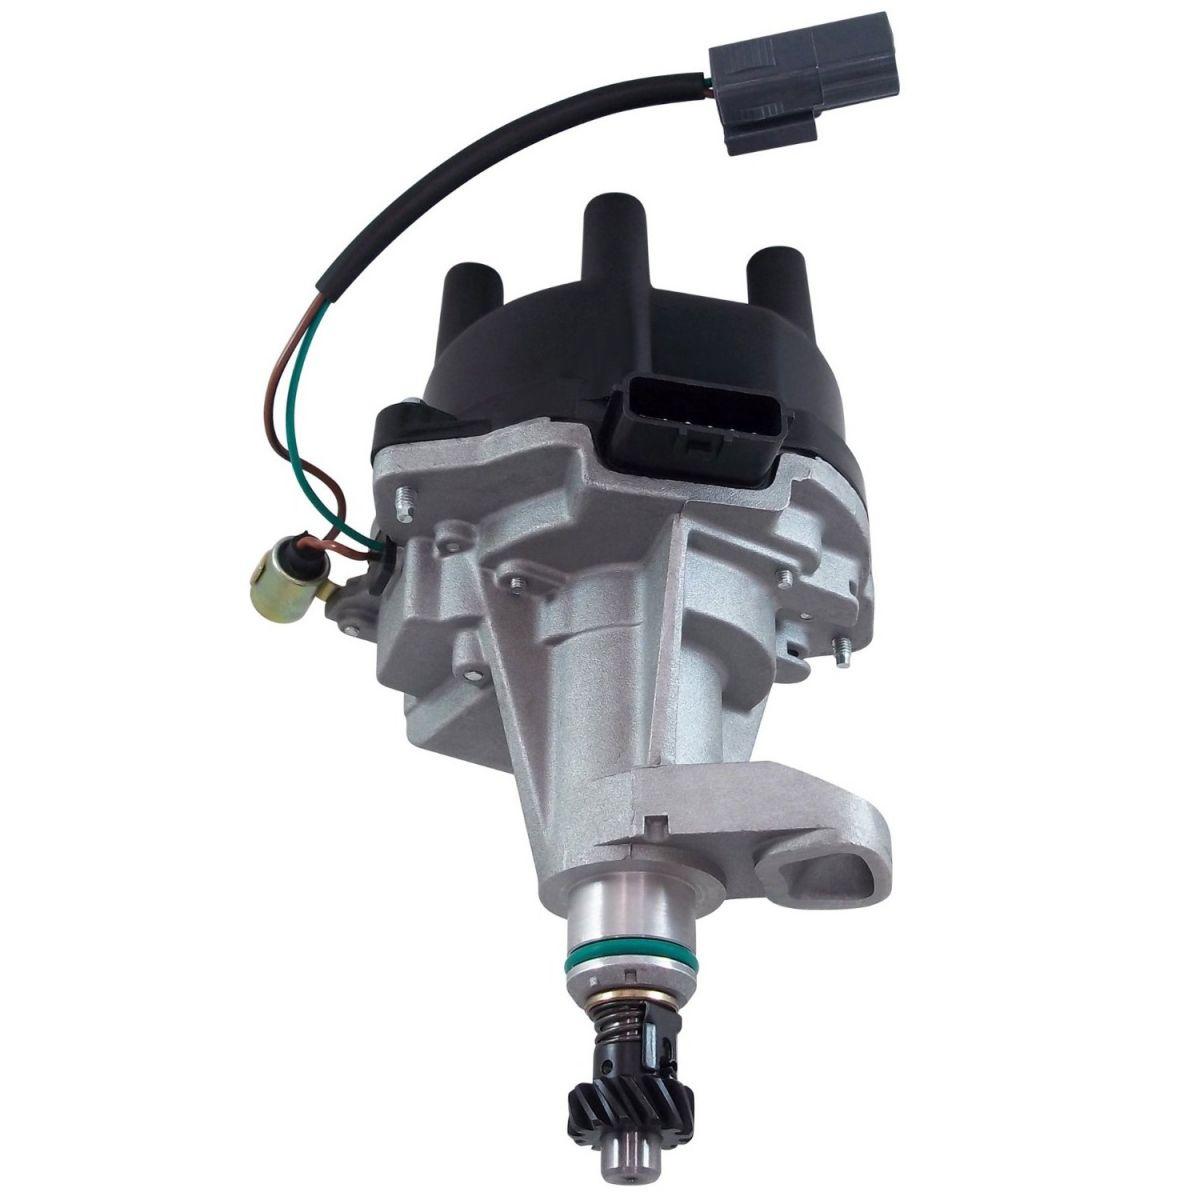 Distribuidor Ignicao Nissan Pathfinder Xterra Frontier  3.3 V6 SOHC